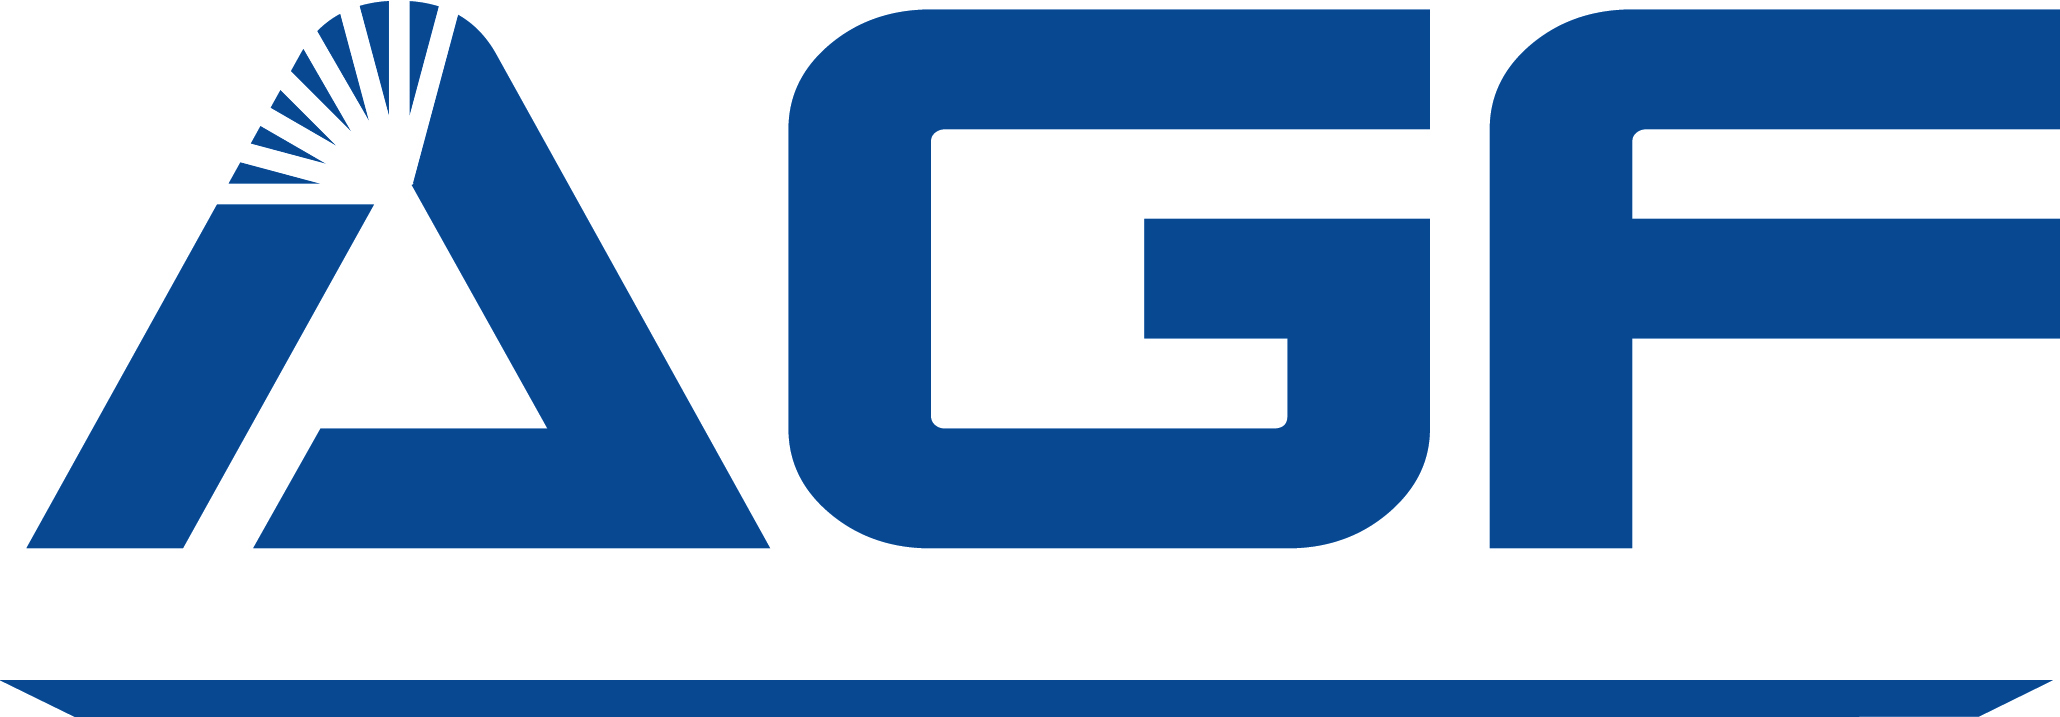 logo Acier AGF (usine Armabec)